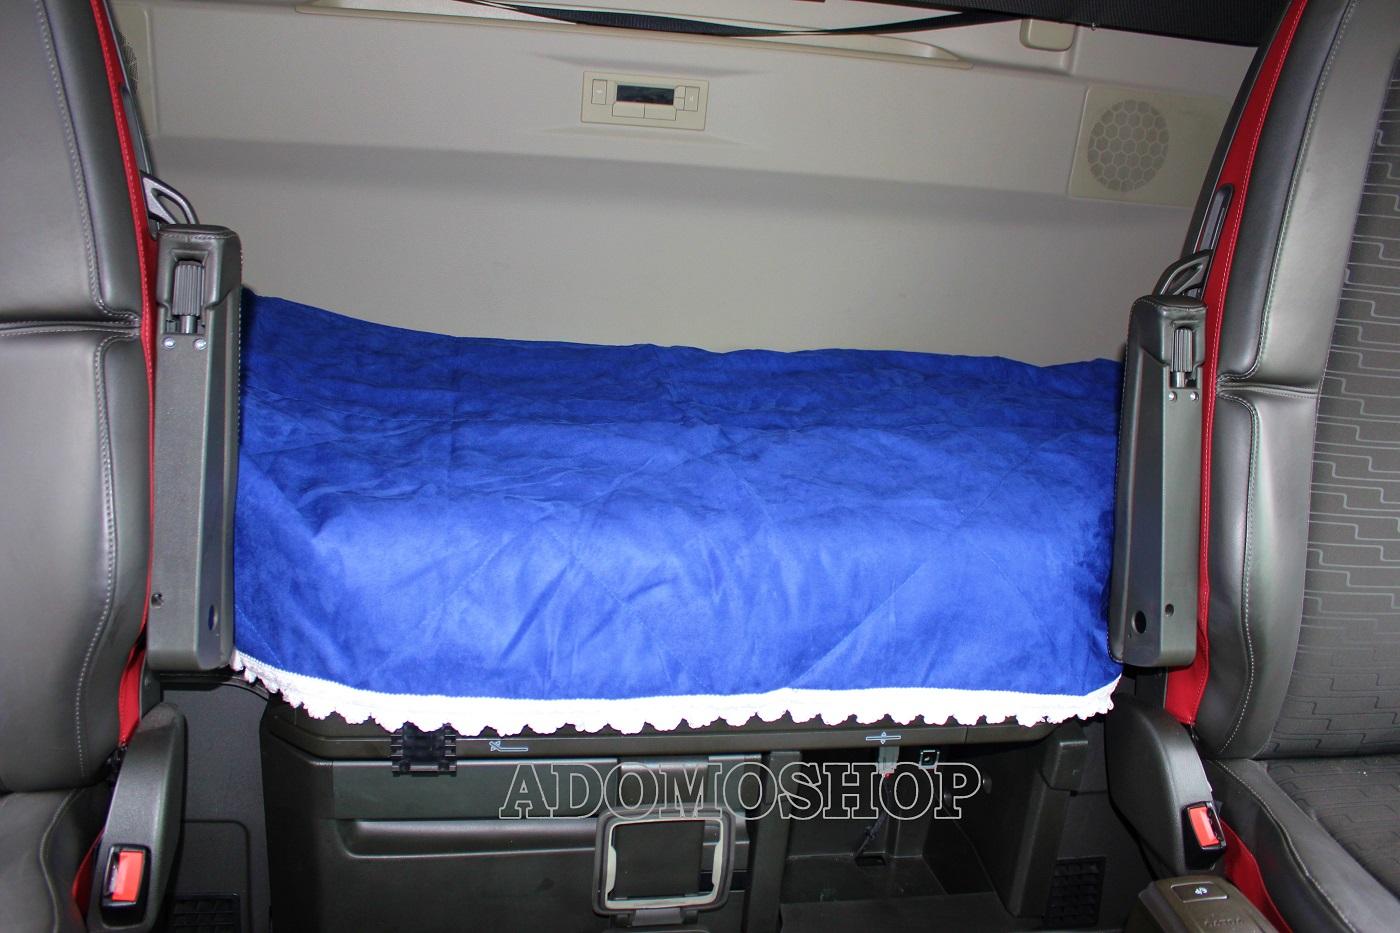 adomo lkw shop tagesdecke blau weiss f r actros man. Black Bedroom Furniture Sets. Home Design Ideas